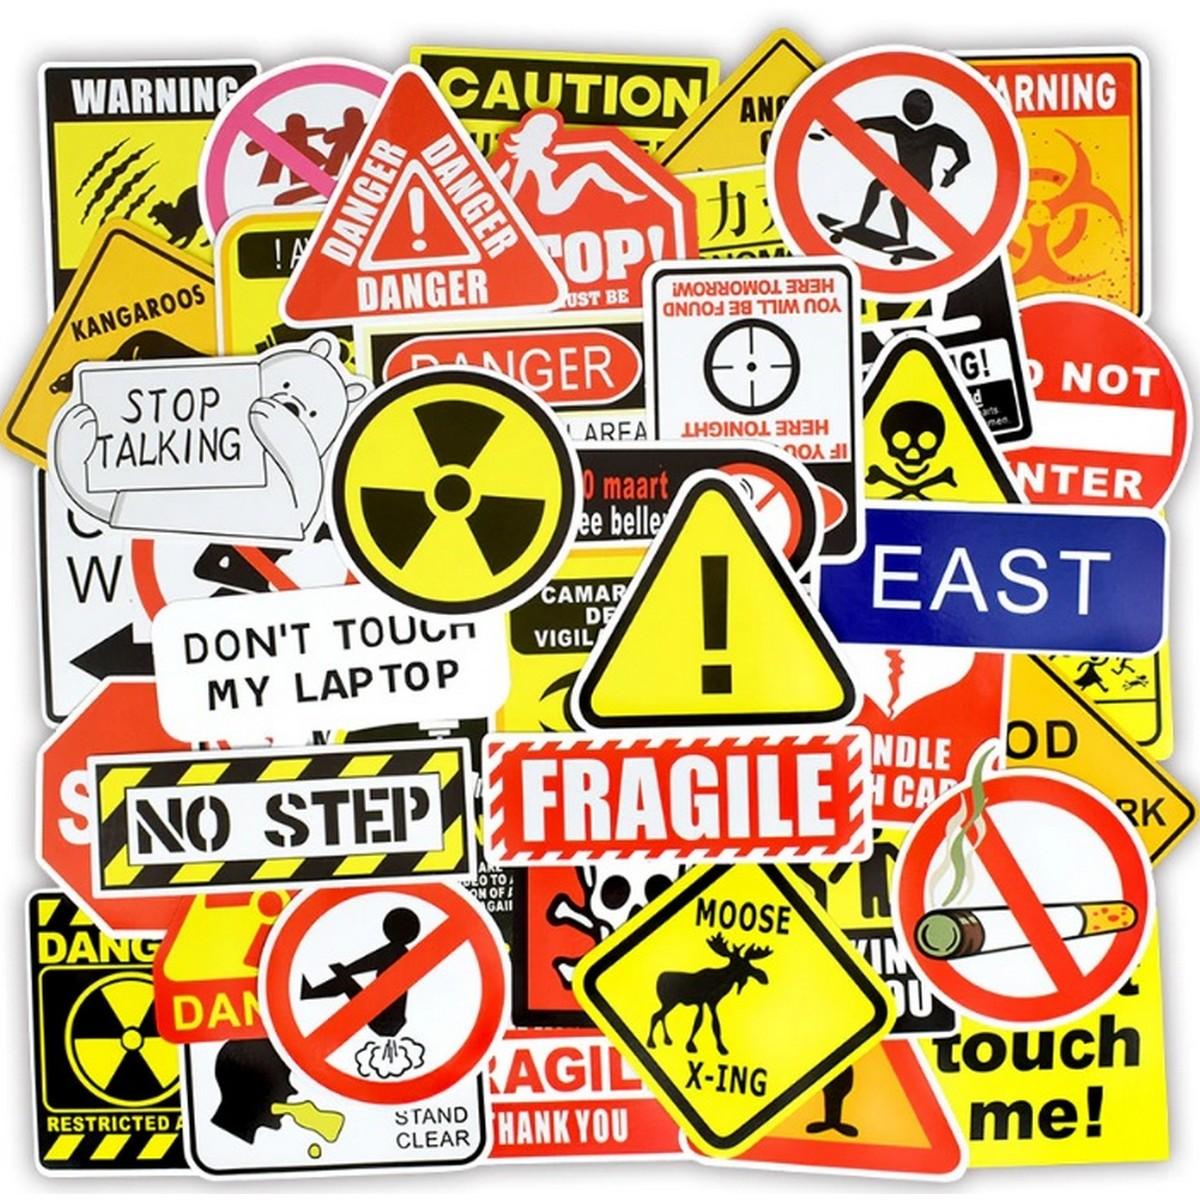 10 Pcs/Pack Warning Danger Banning Signs Waterproof Stickers for Car,Laptop,Bike,Skateboard